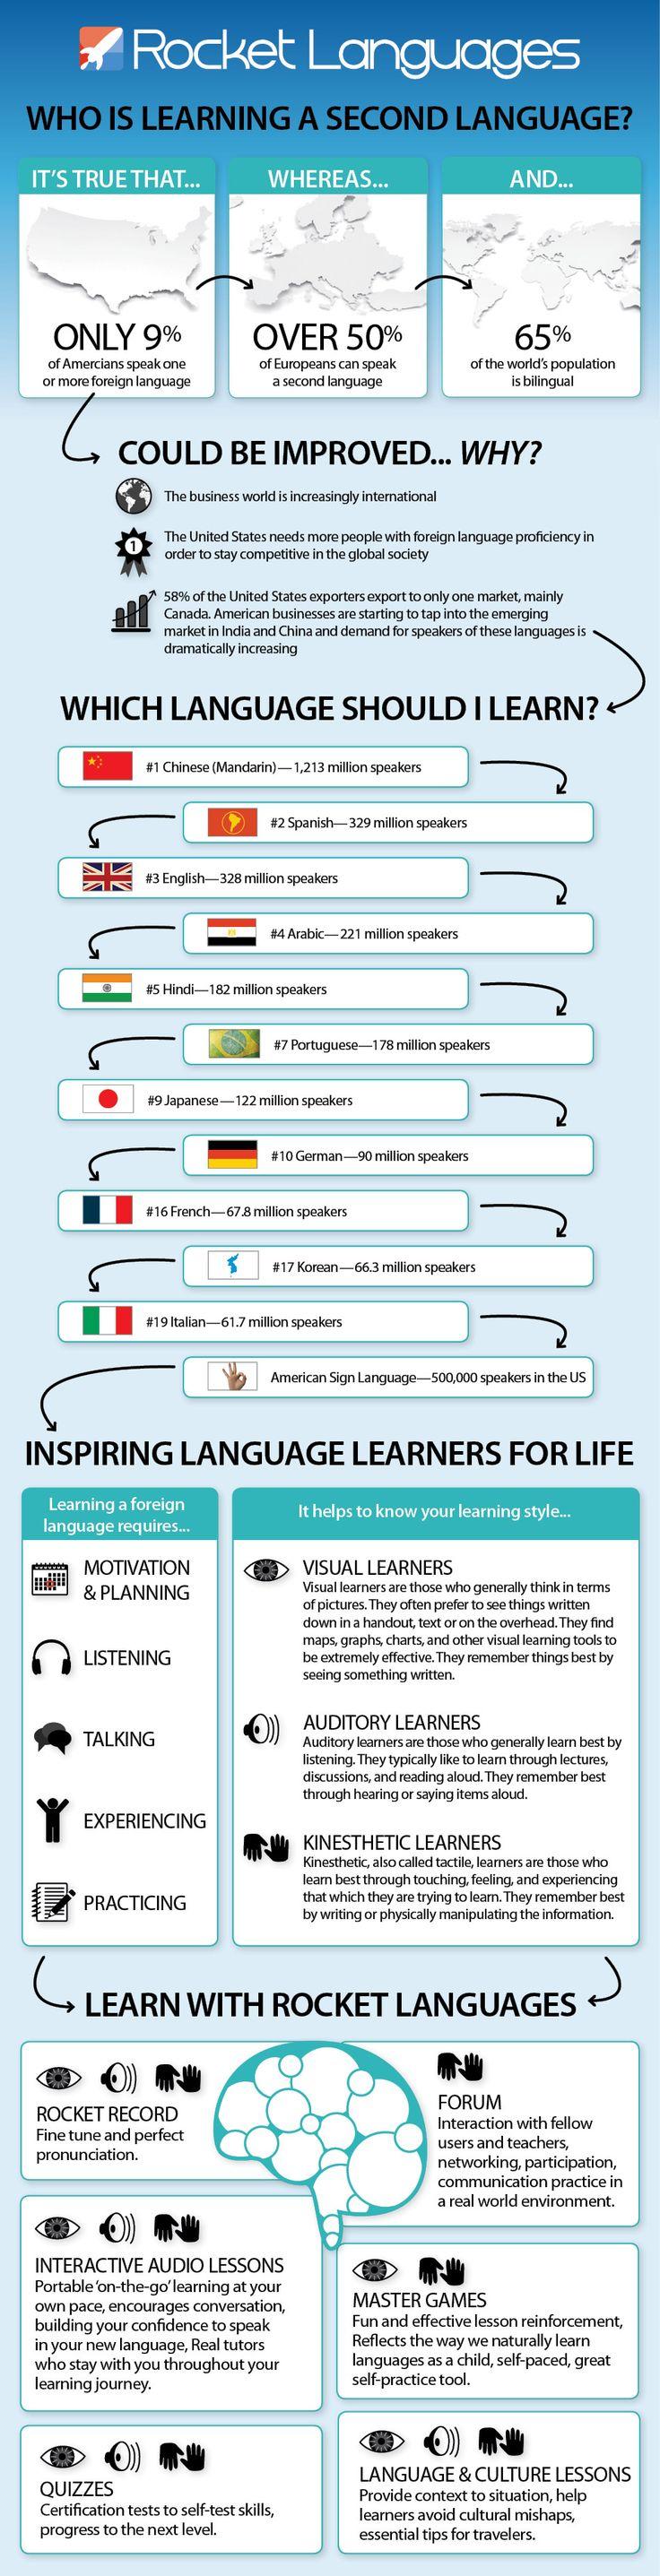 David Snam - Online Secrets: LEARN TO SPEAK SPANISH FAST AND EASY